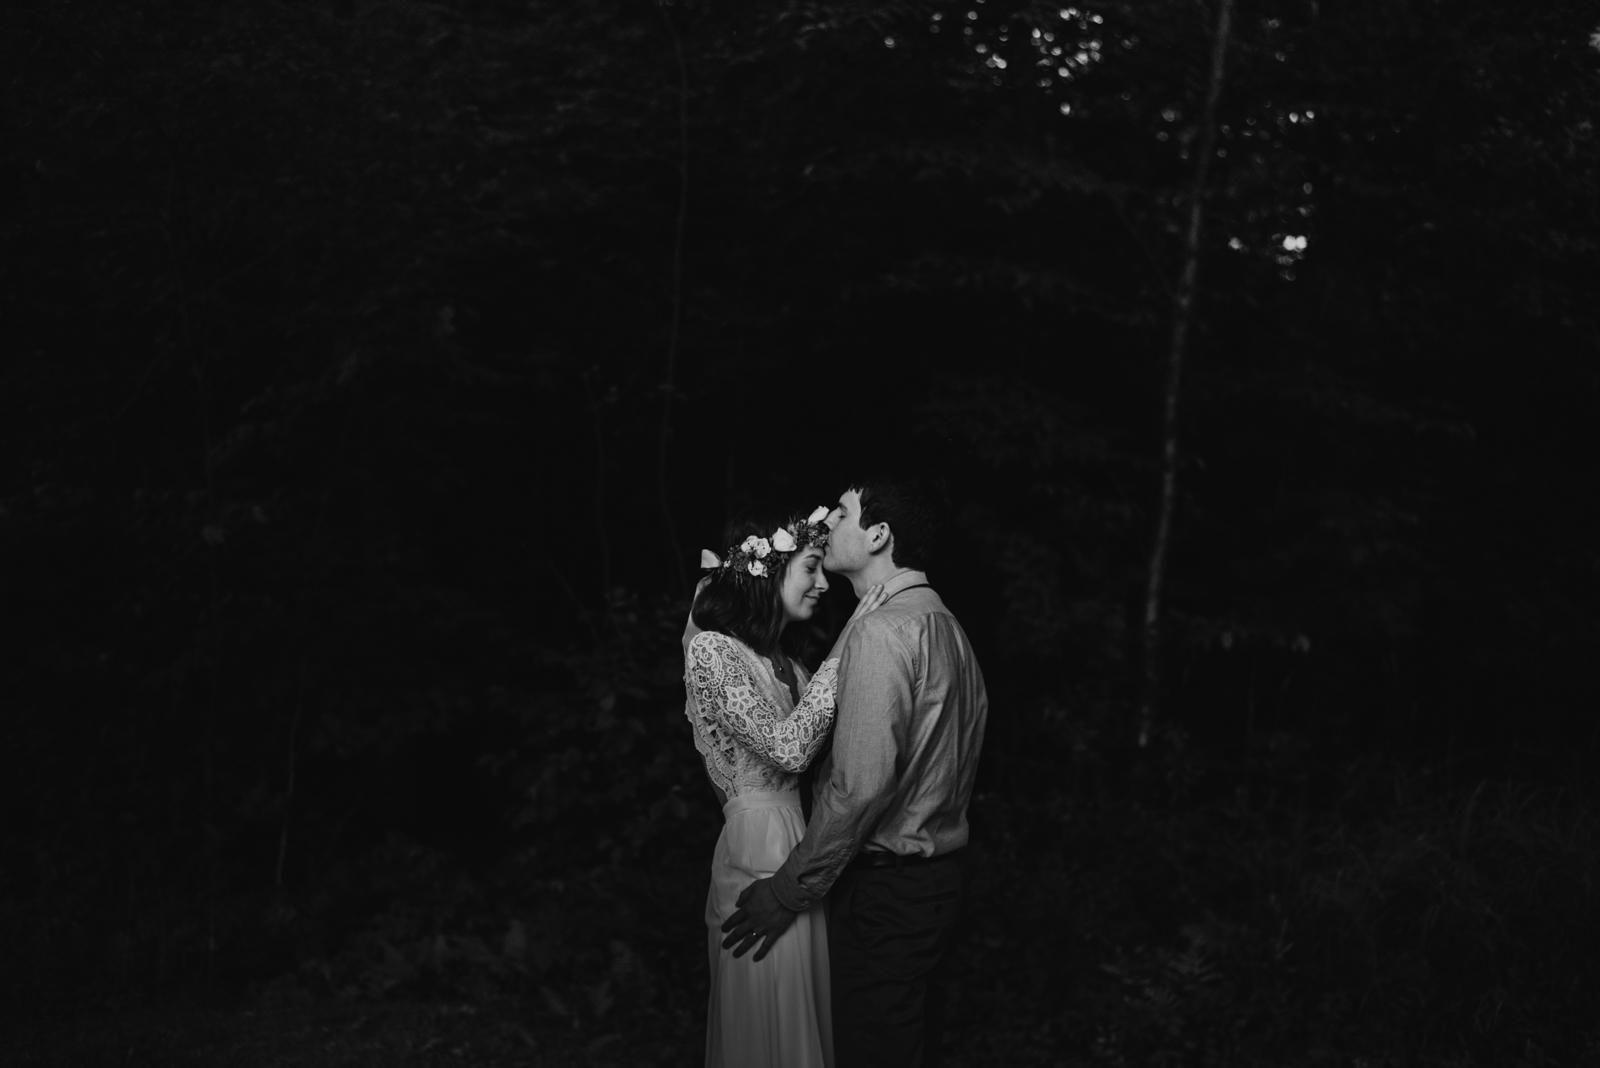 08192018-JessicaJordan-JuliaLuckettPhotography-304.jpg